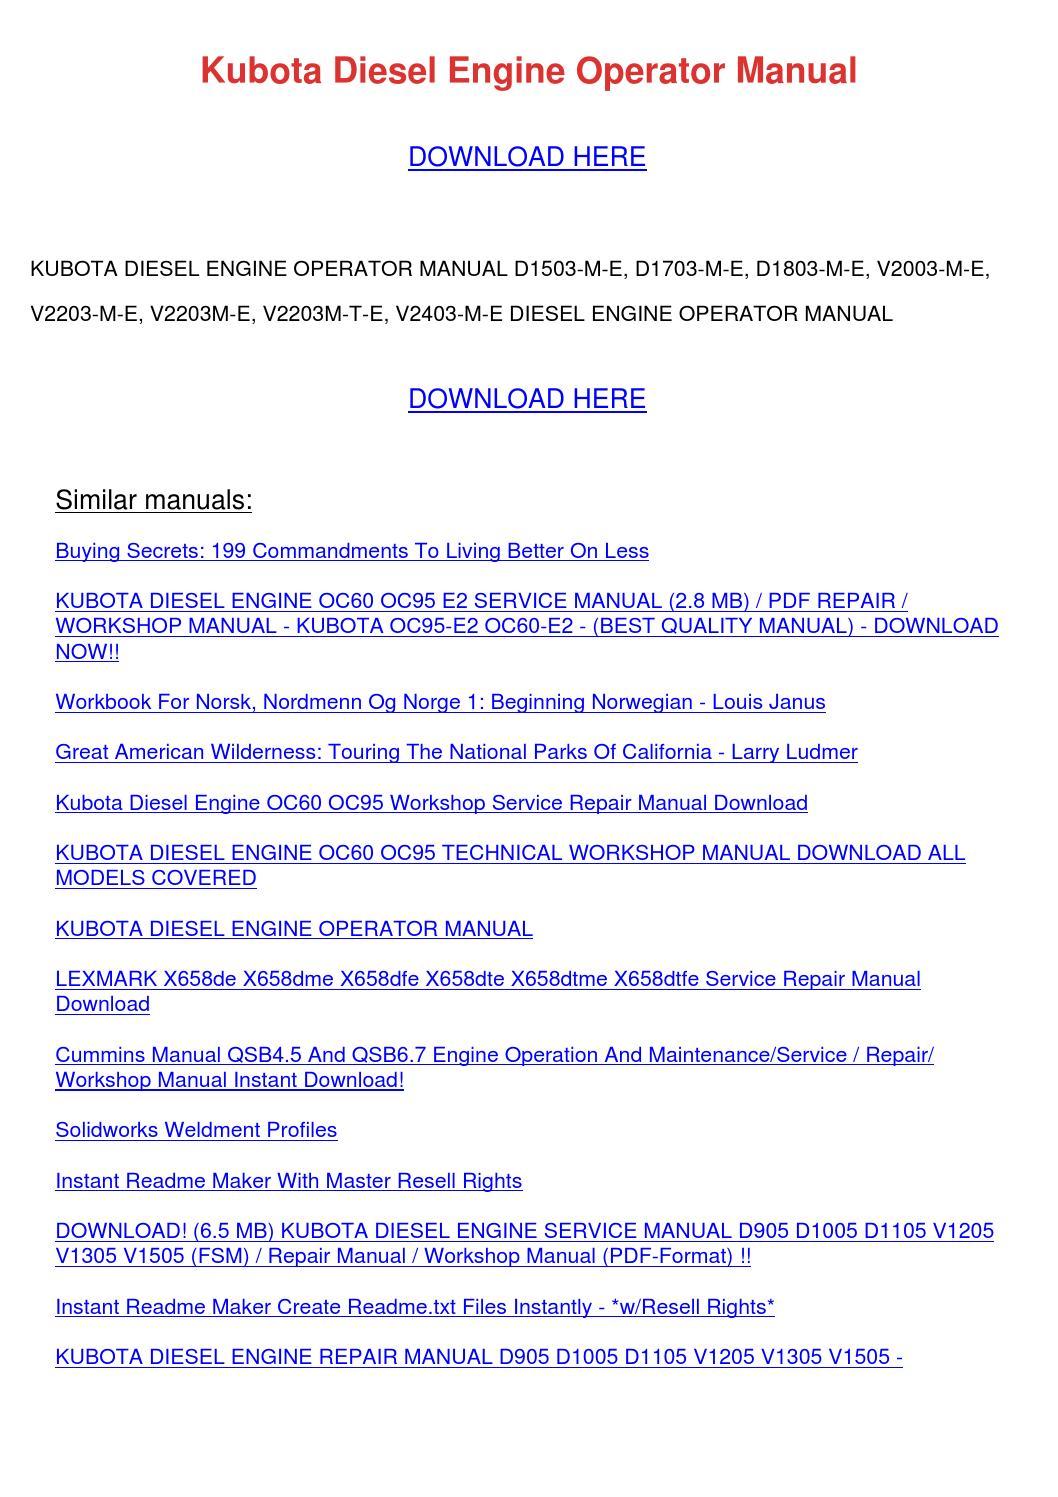 Kubota Diesel Engine Operator Manual by JosefinaHogan - issuu